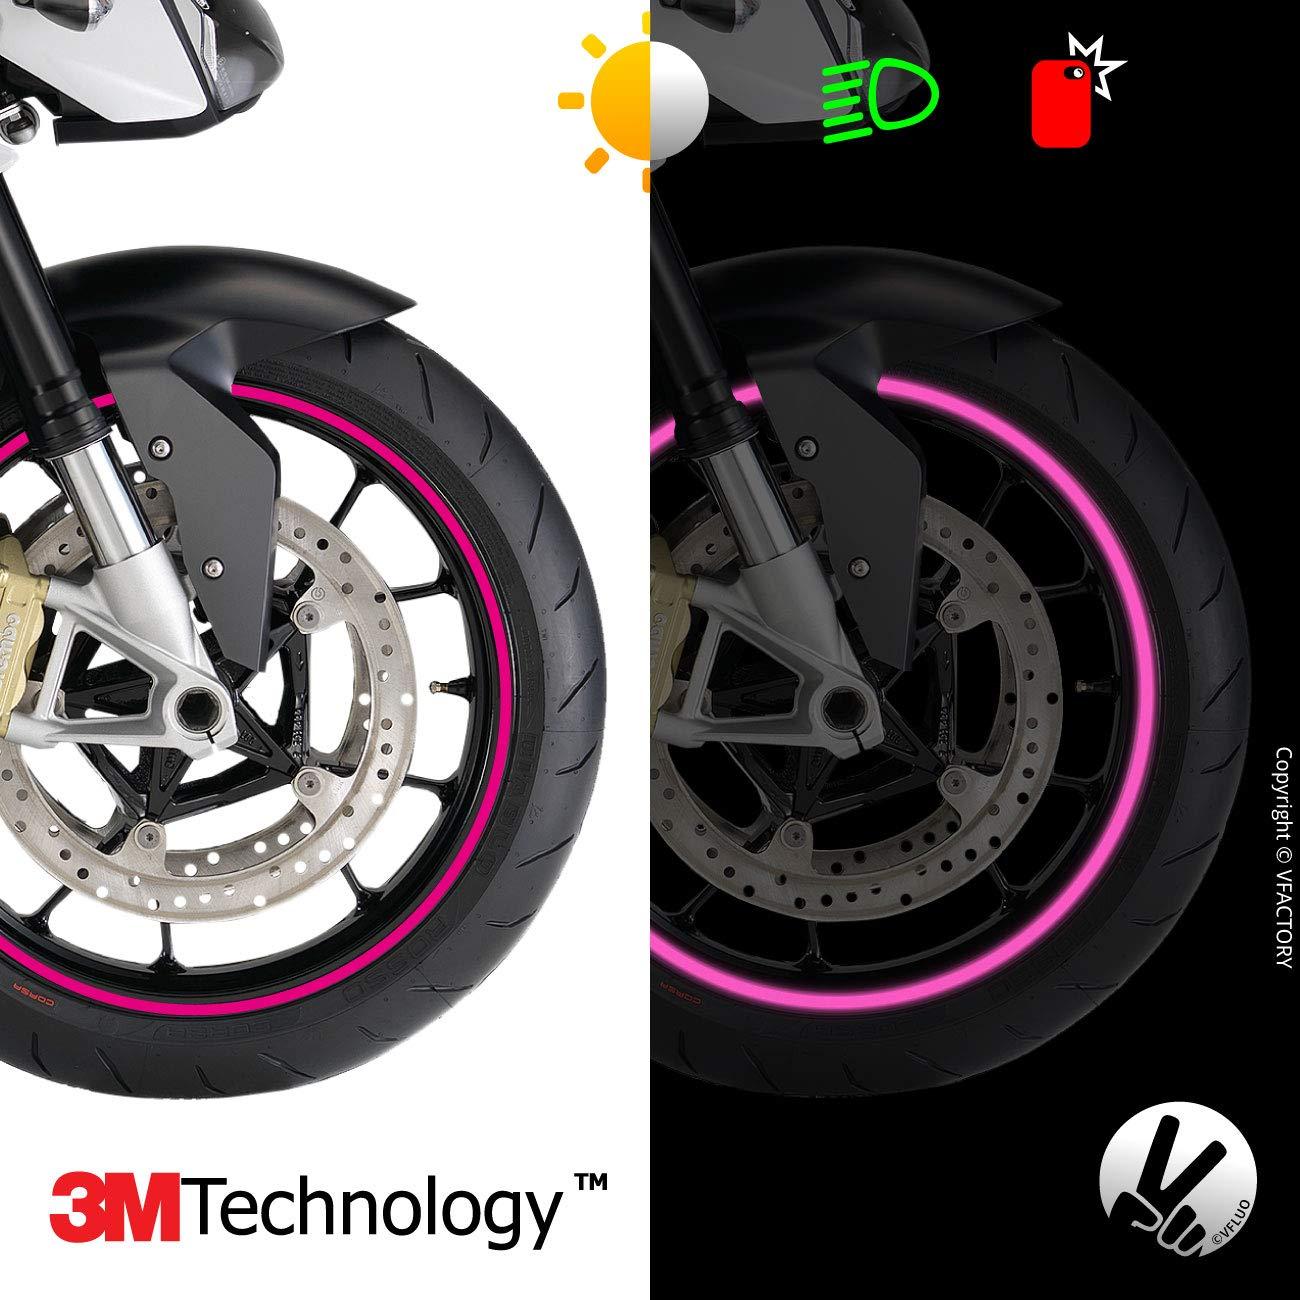 motorcycle retro reflective wheel stripes kit VFLUO CIRCULAR/™ 1 wheel 7 mm width 3M Technology/™ Black